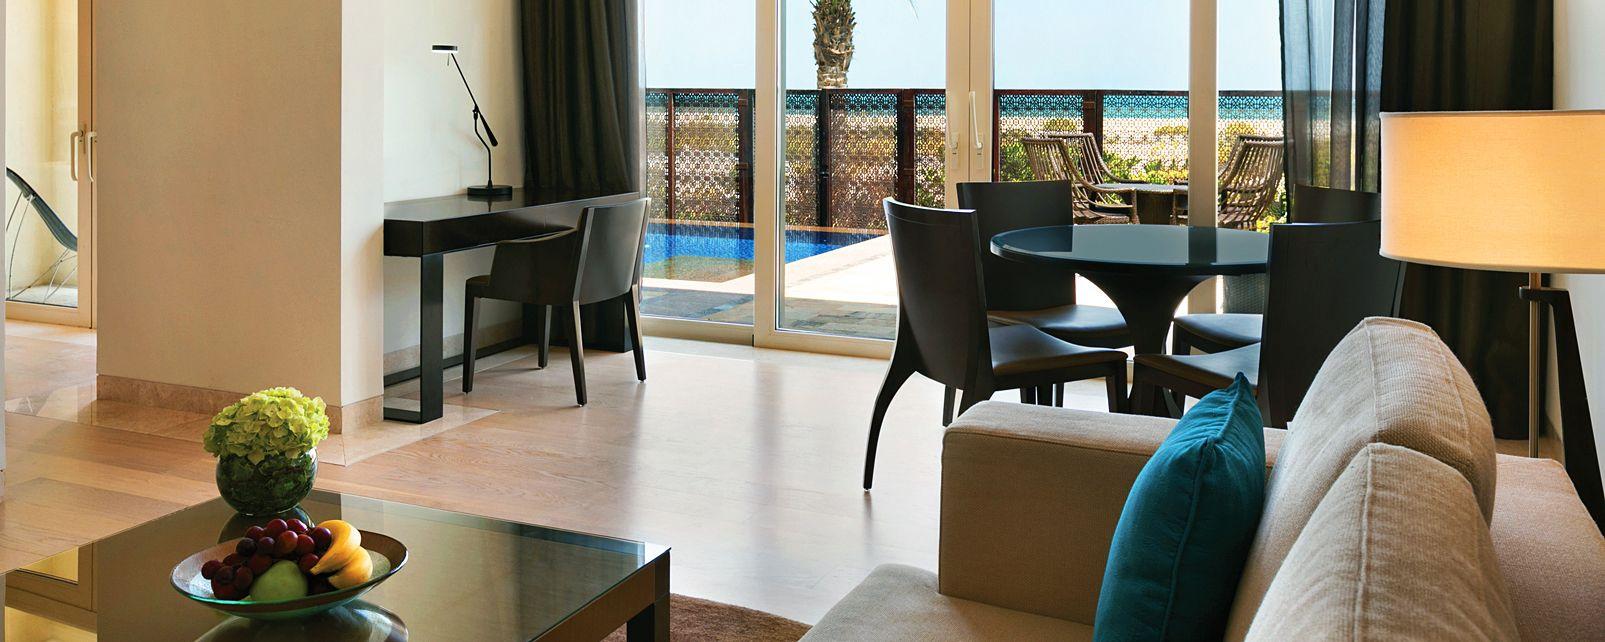 Hôtel Park Hyatt Abu Dhabi